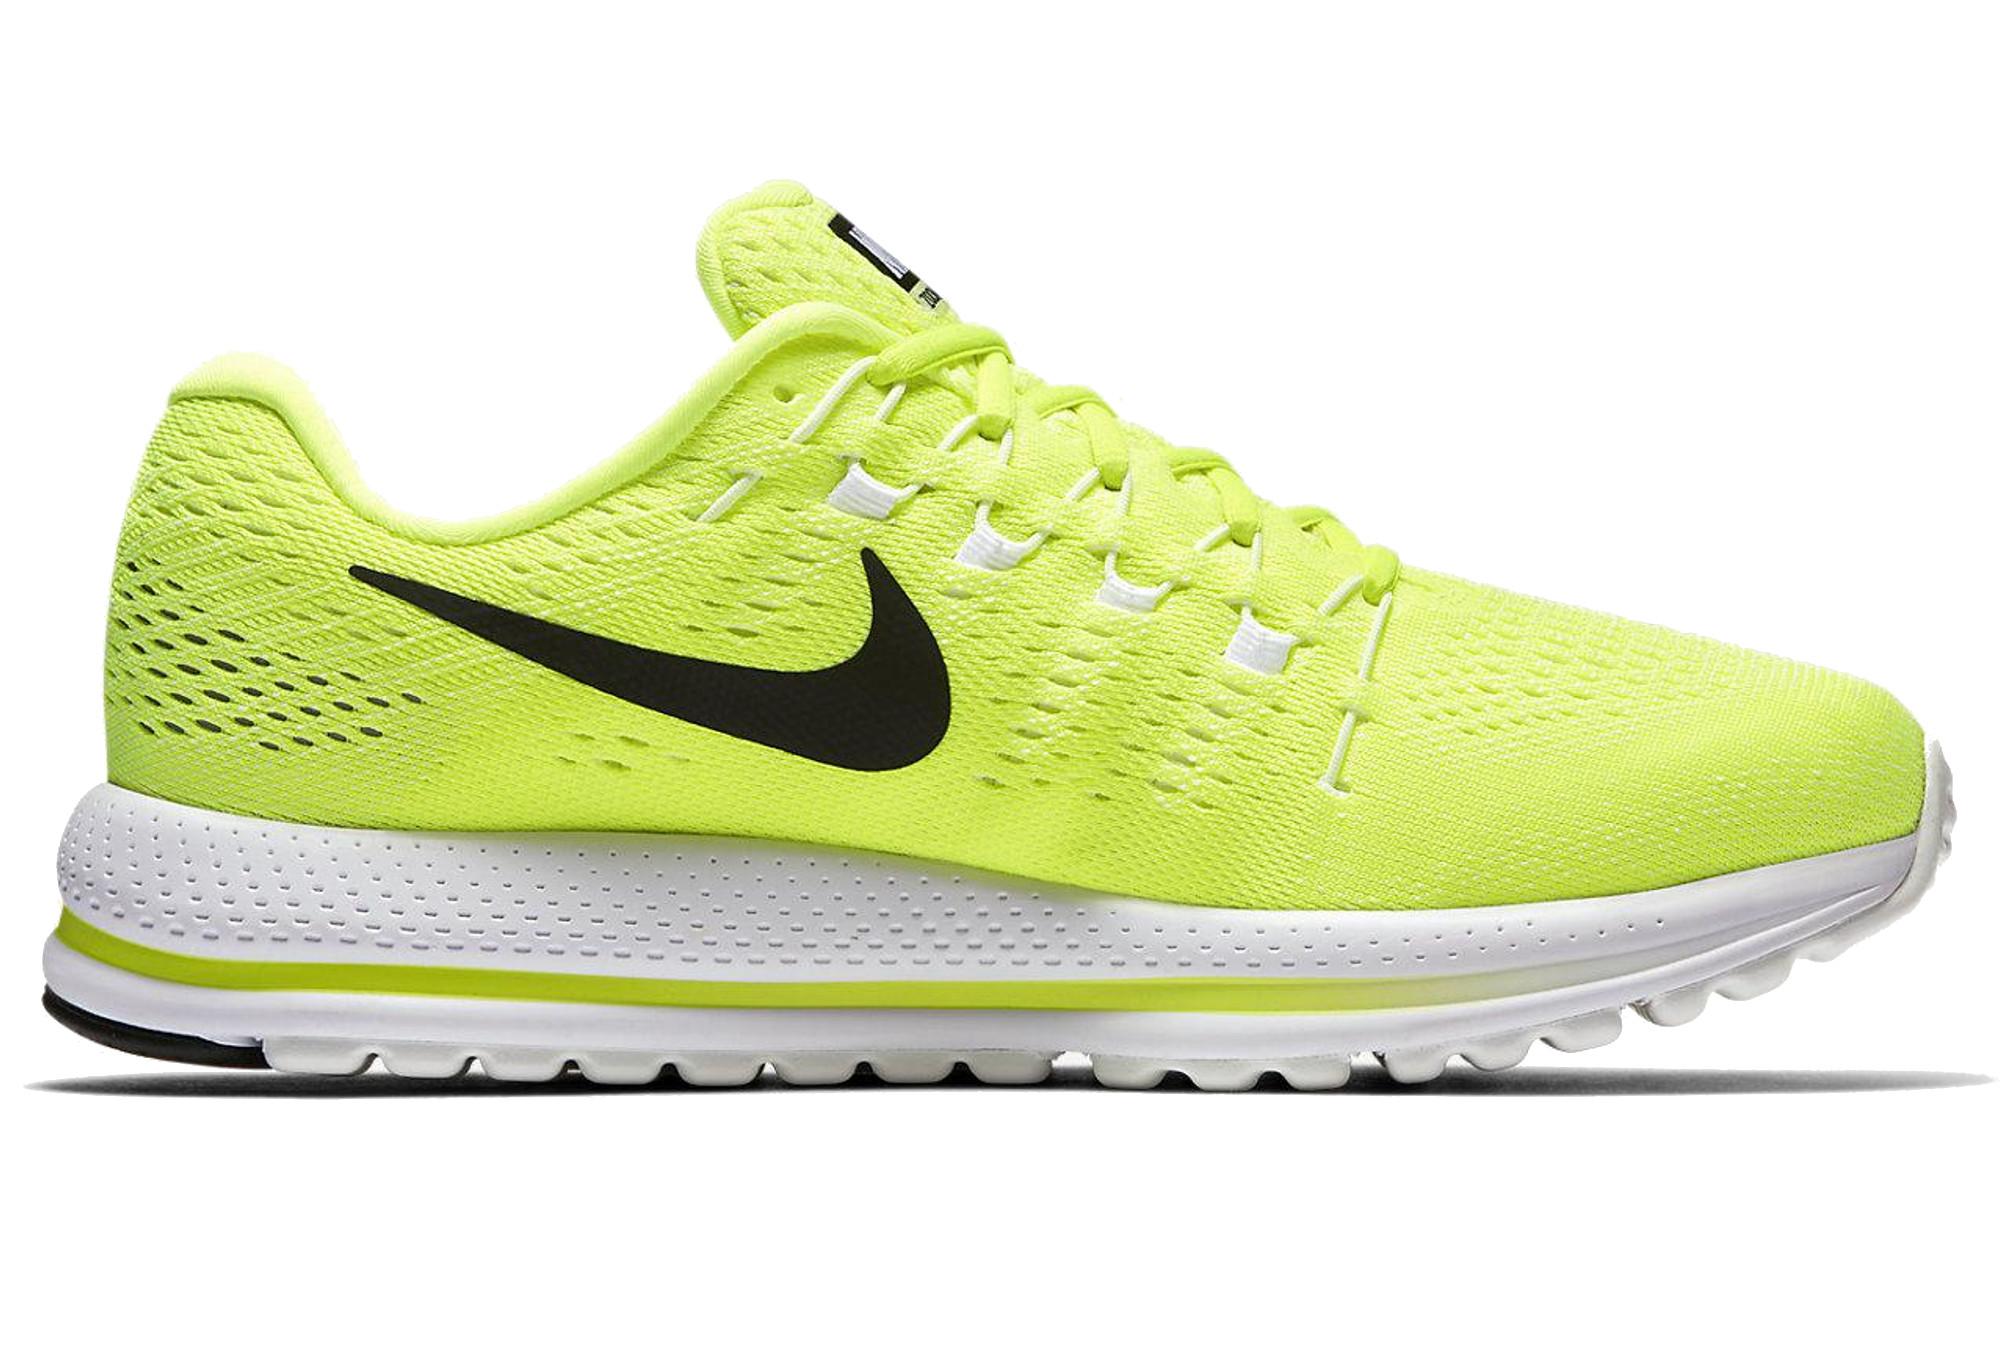 a586086ec2ae2 Chaussures de Running Nike AIR ZOOM VOMERO 12 Jaune   Blanc ...